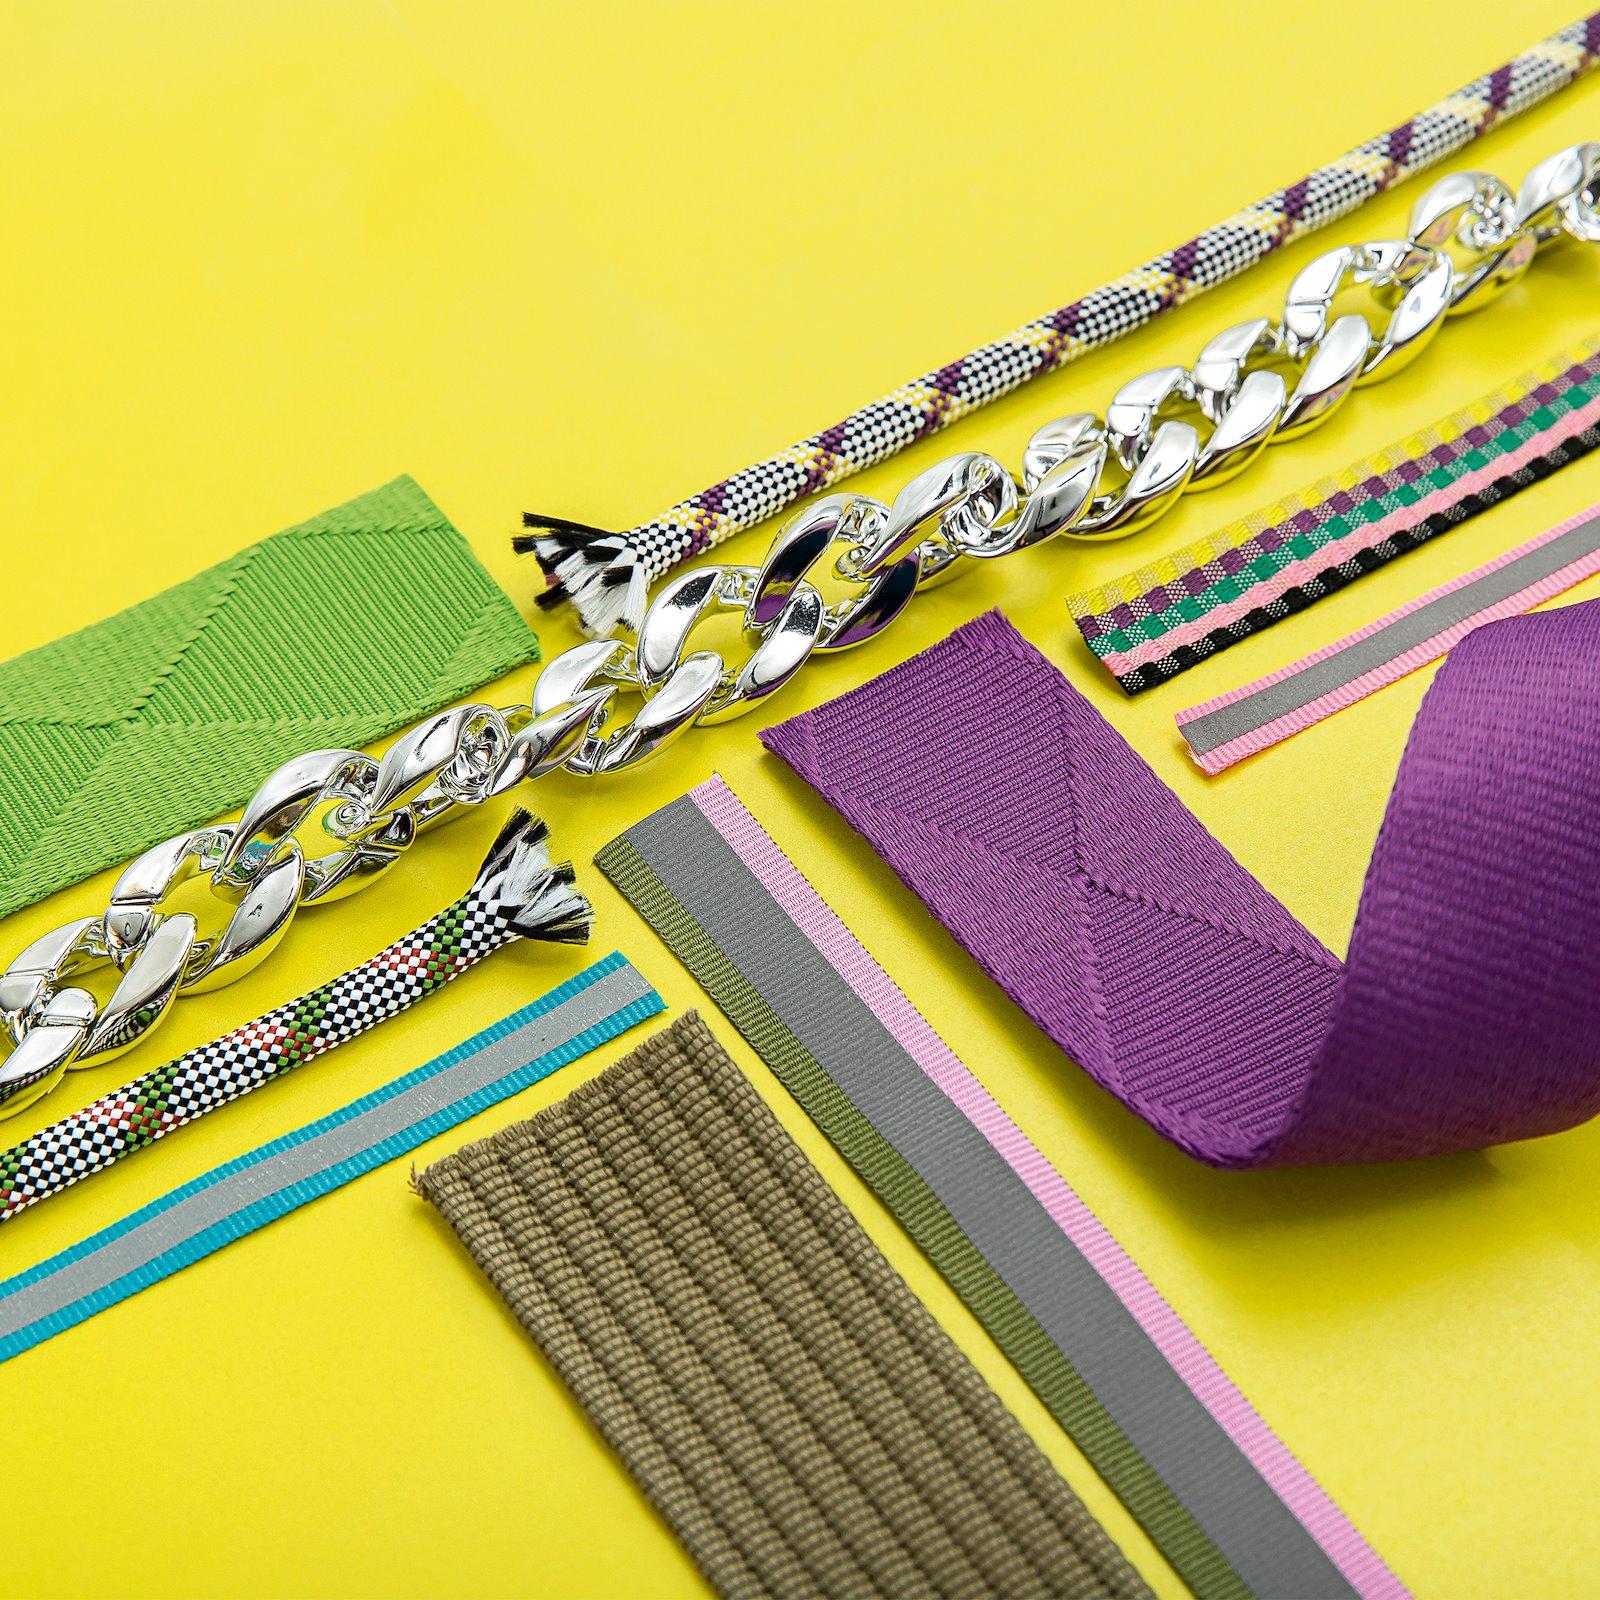 Ribbon check woven 17mm multi colour 3m 22292_22276_38100_22394_22201_22293_22200_22405_22202_22277_bundle